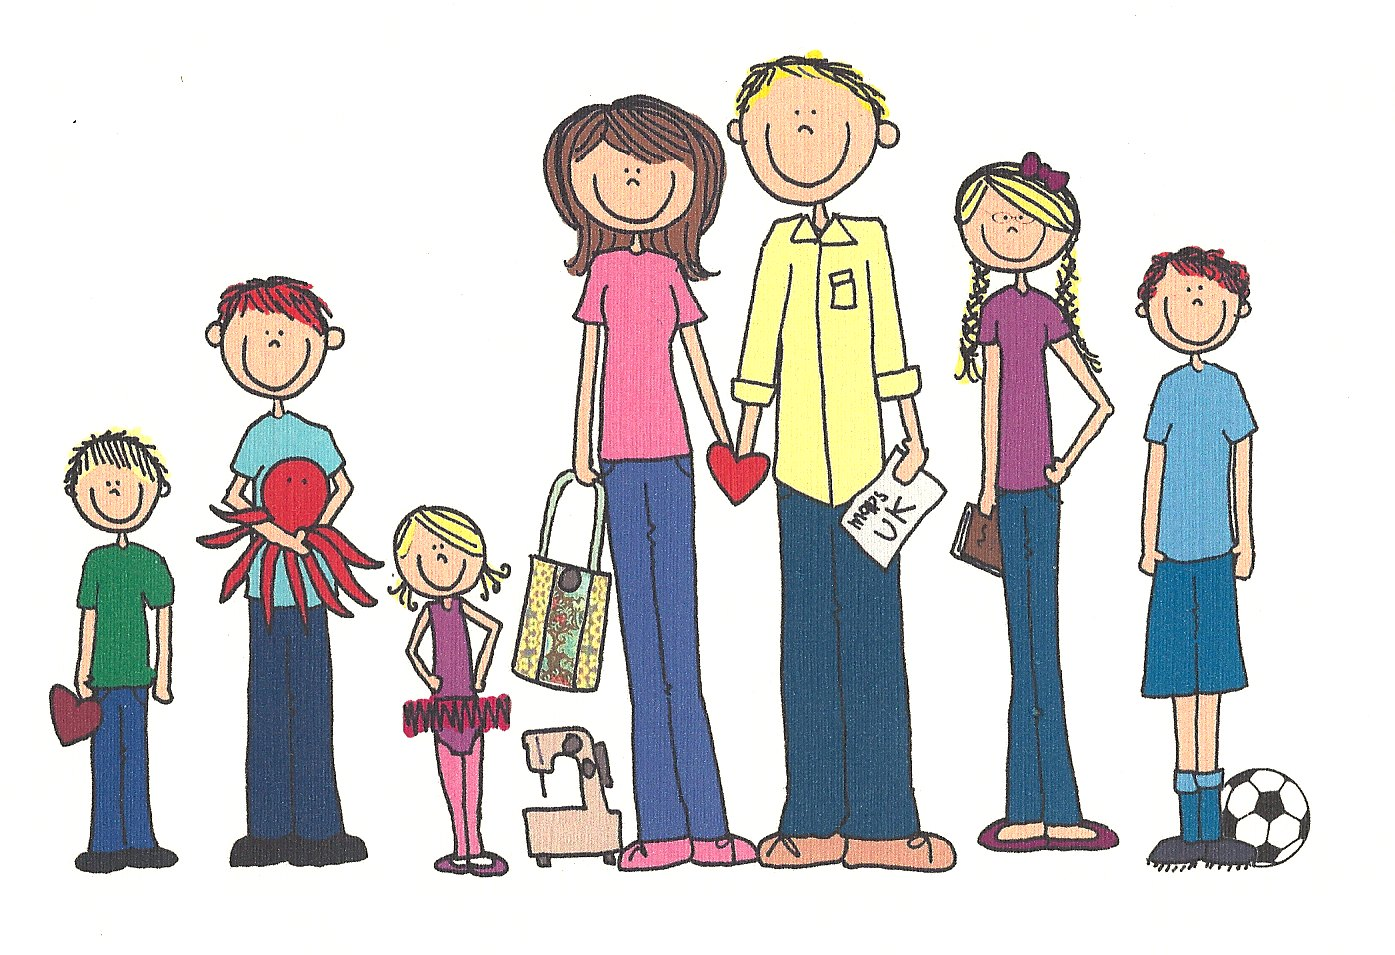 Cartoon family clipart banner royalty free stock Free Cartoon Family Of 5, Download Free Clip Art, Free Clip Art on ... banner royalty free stock